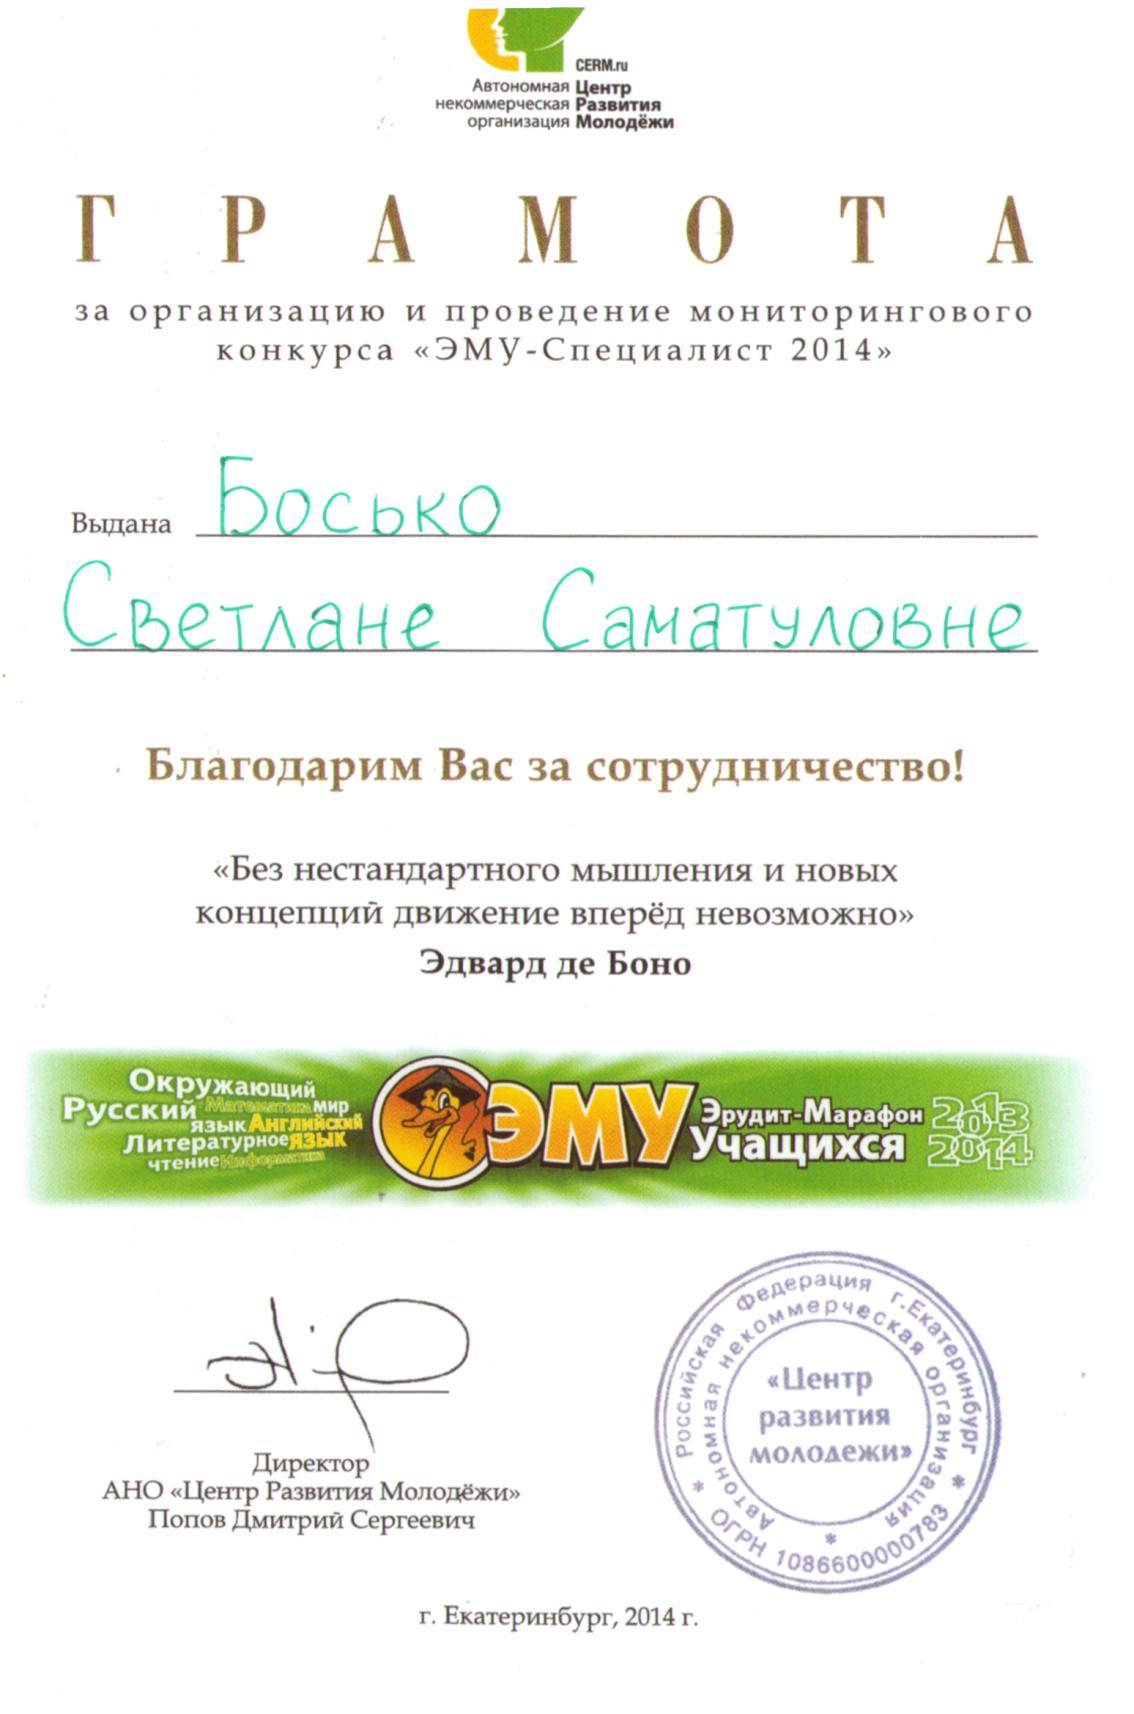 C:\Documents and Settings\Светлана Саматуловна\Рабочий стол\квалификация\14 грам0002.tif